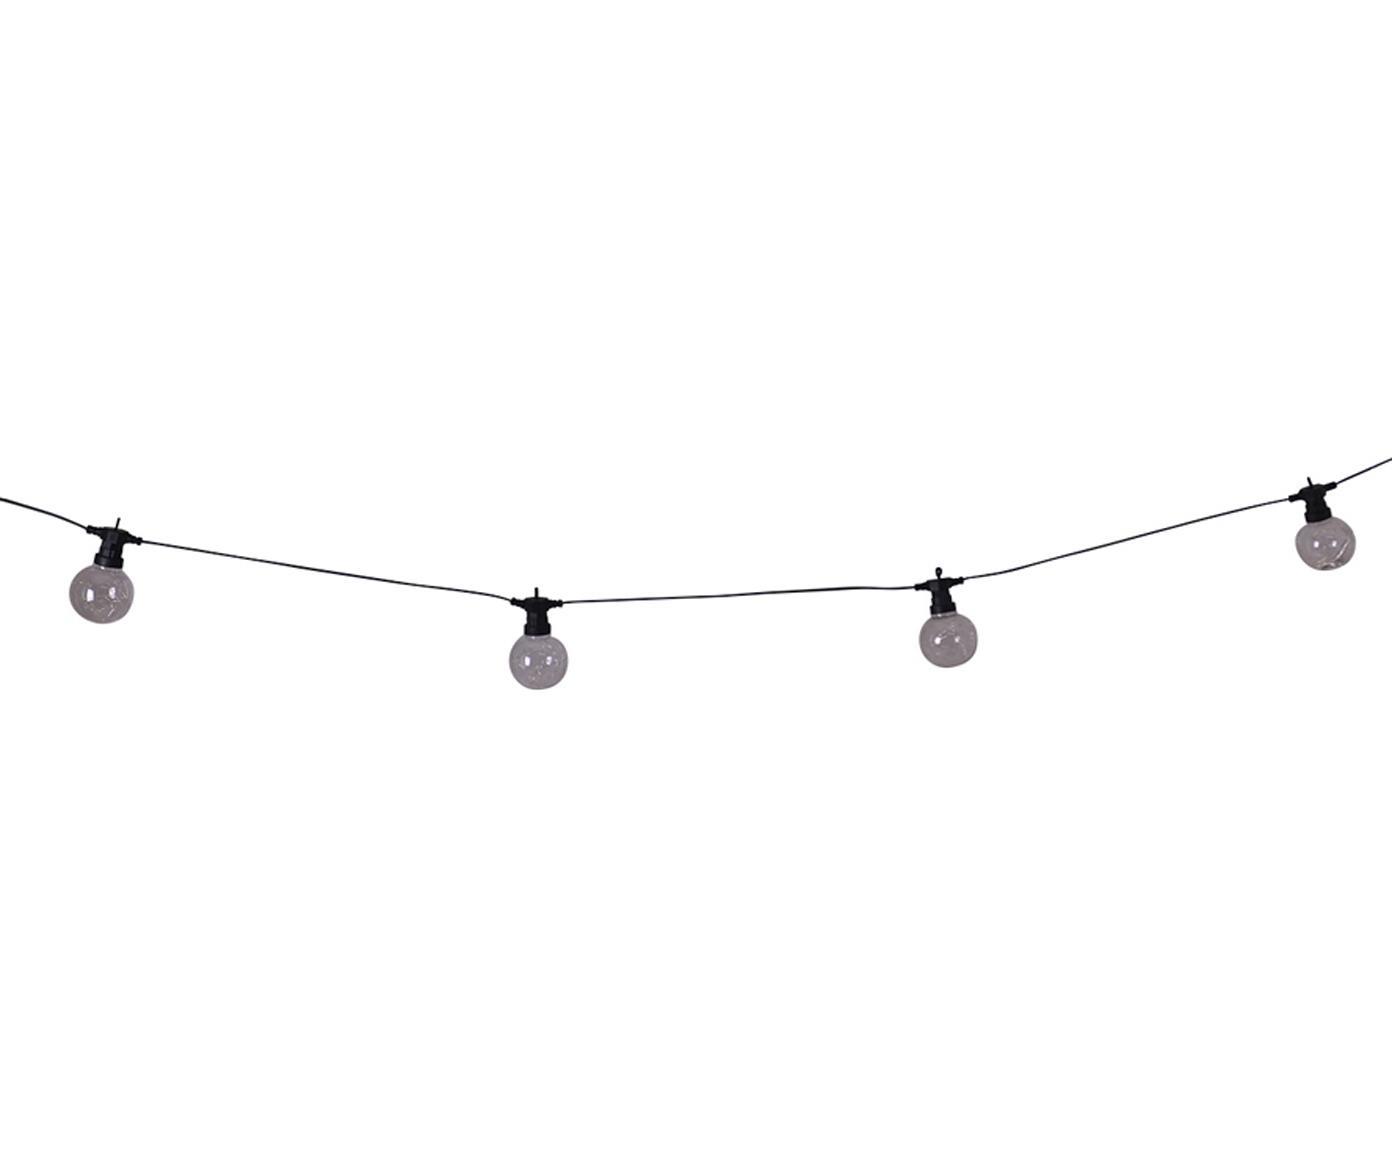 Ghirlanda  a LED Crackle Chain, Materiale sintetico, Trasparente, Lung. 750 cm